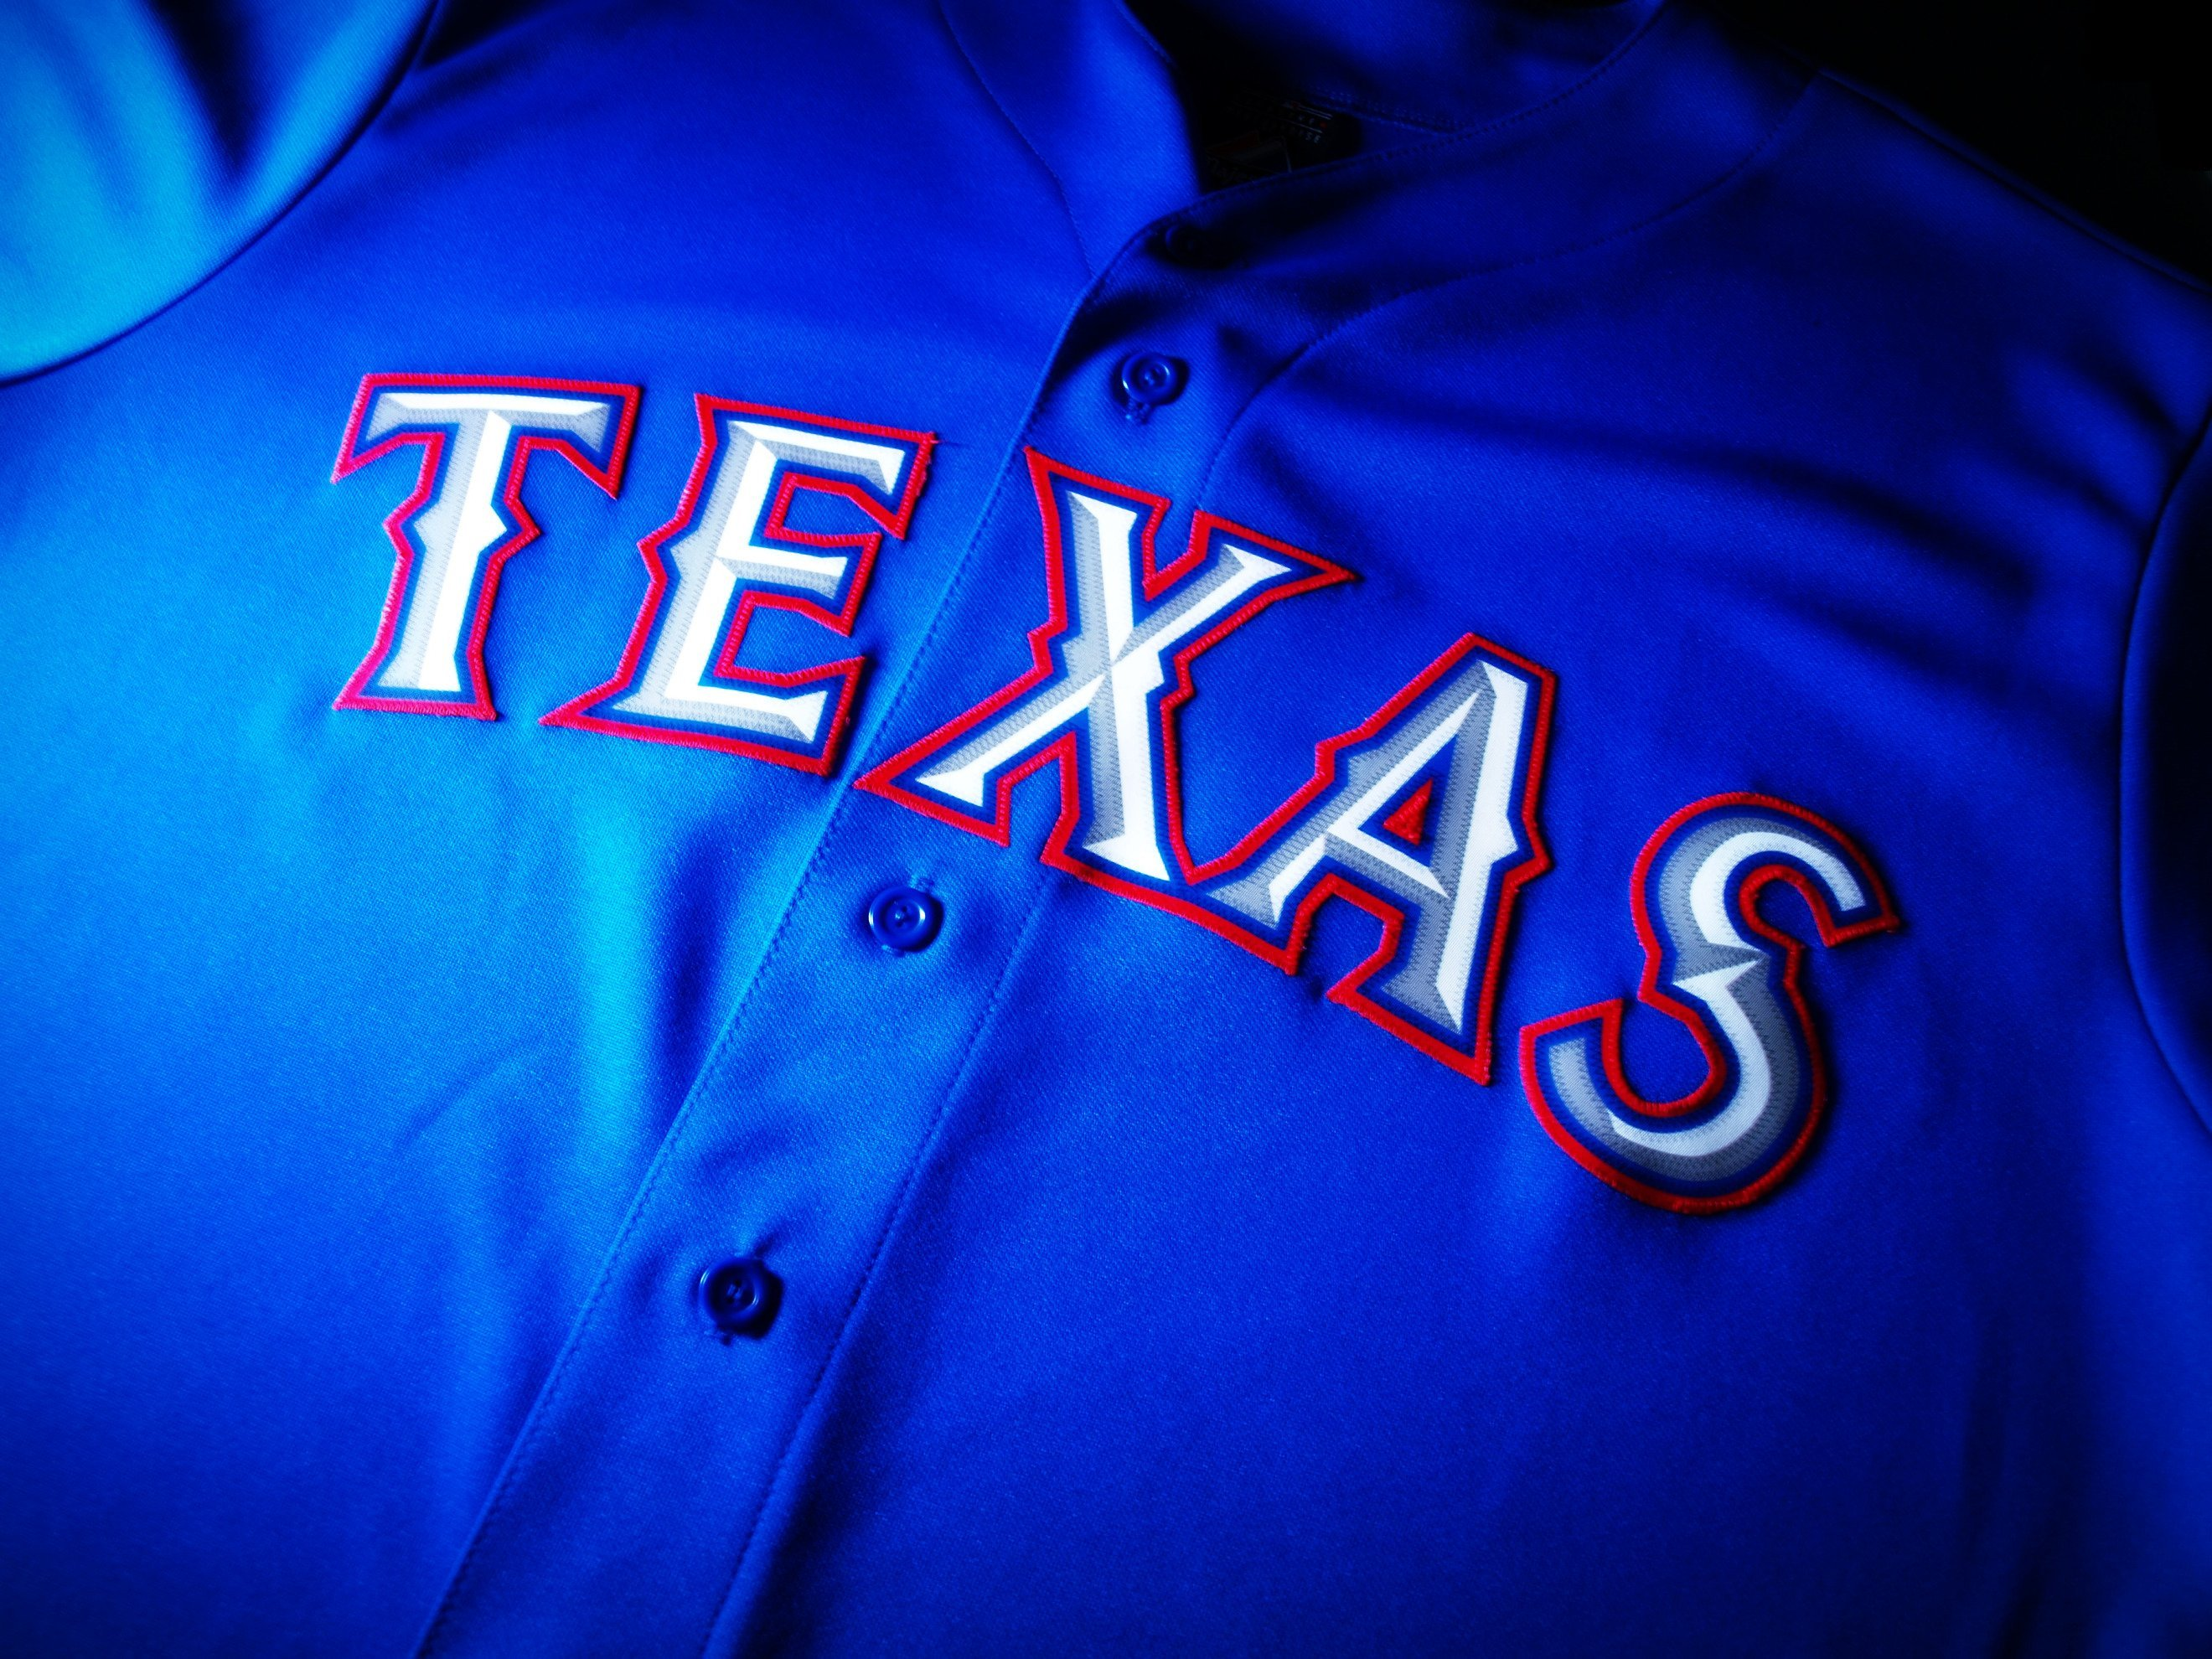 TEXAS RANGERS baseball mlb 55 wallpaper 2640x1980 319028 2640x1980